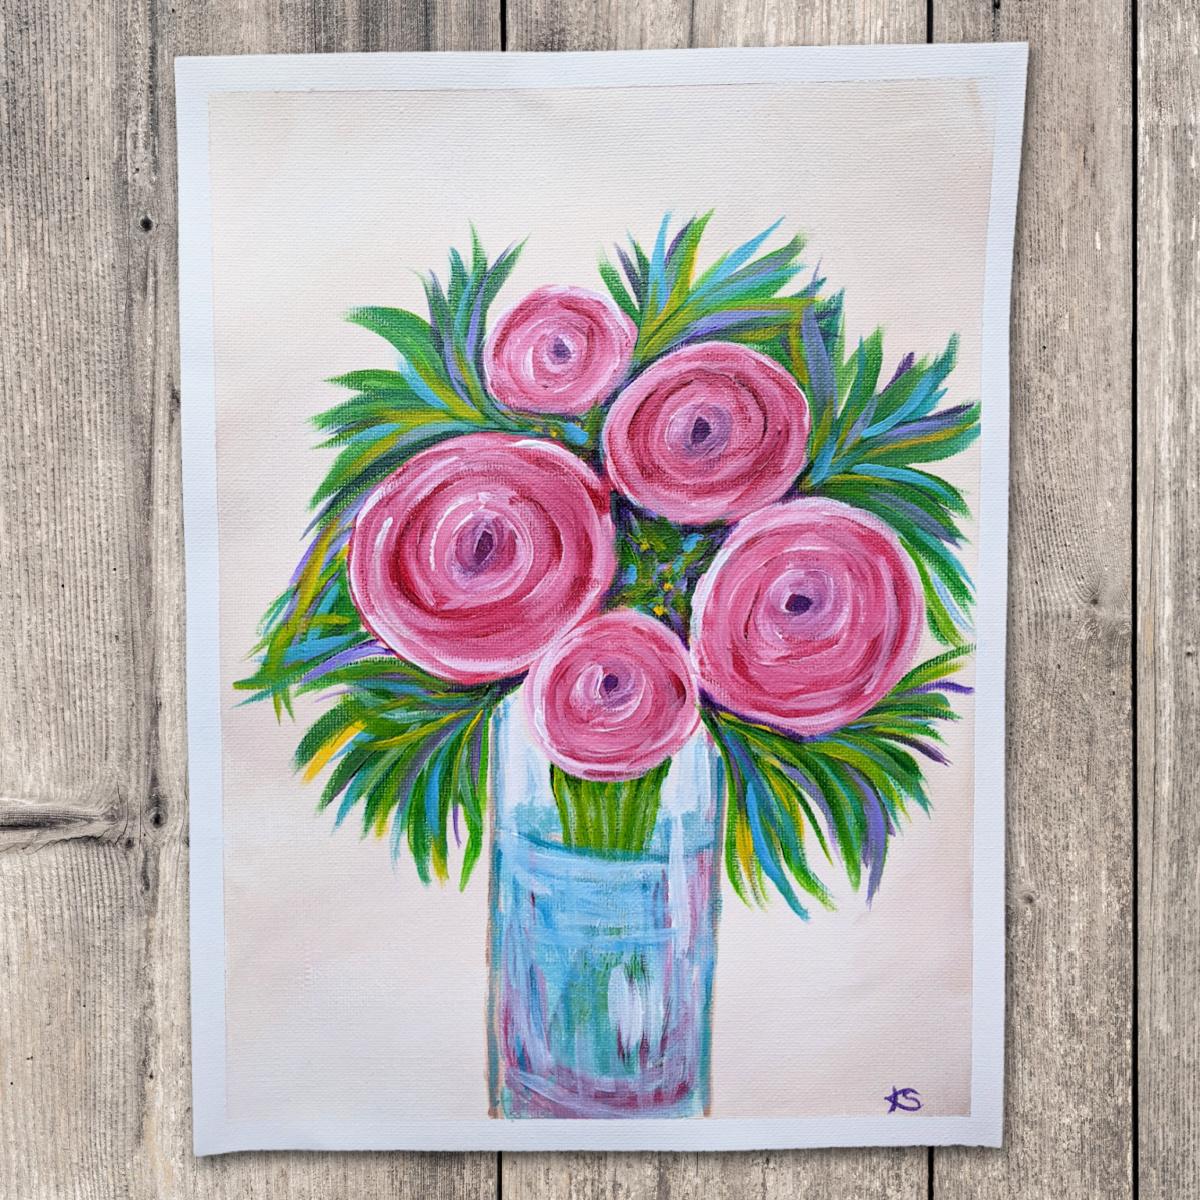 Abstract floral - KS - Kellie Sansone